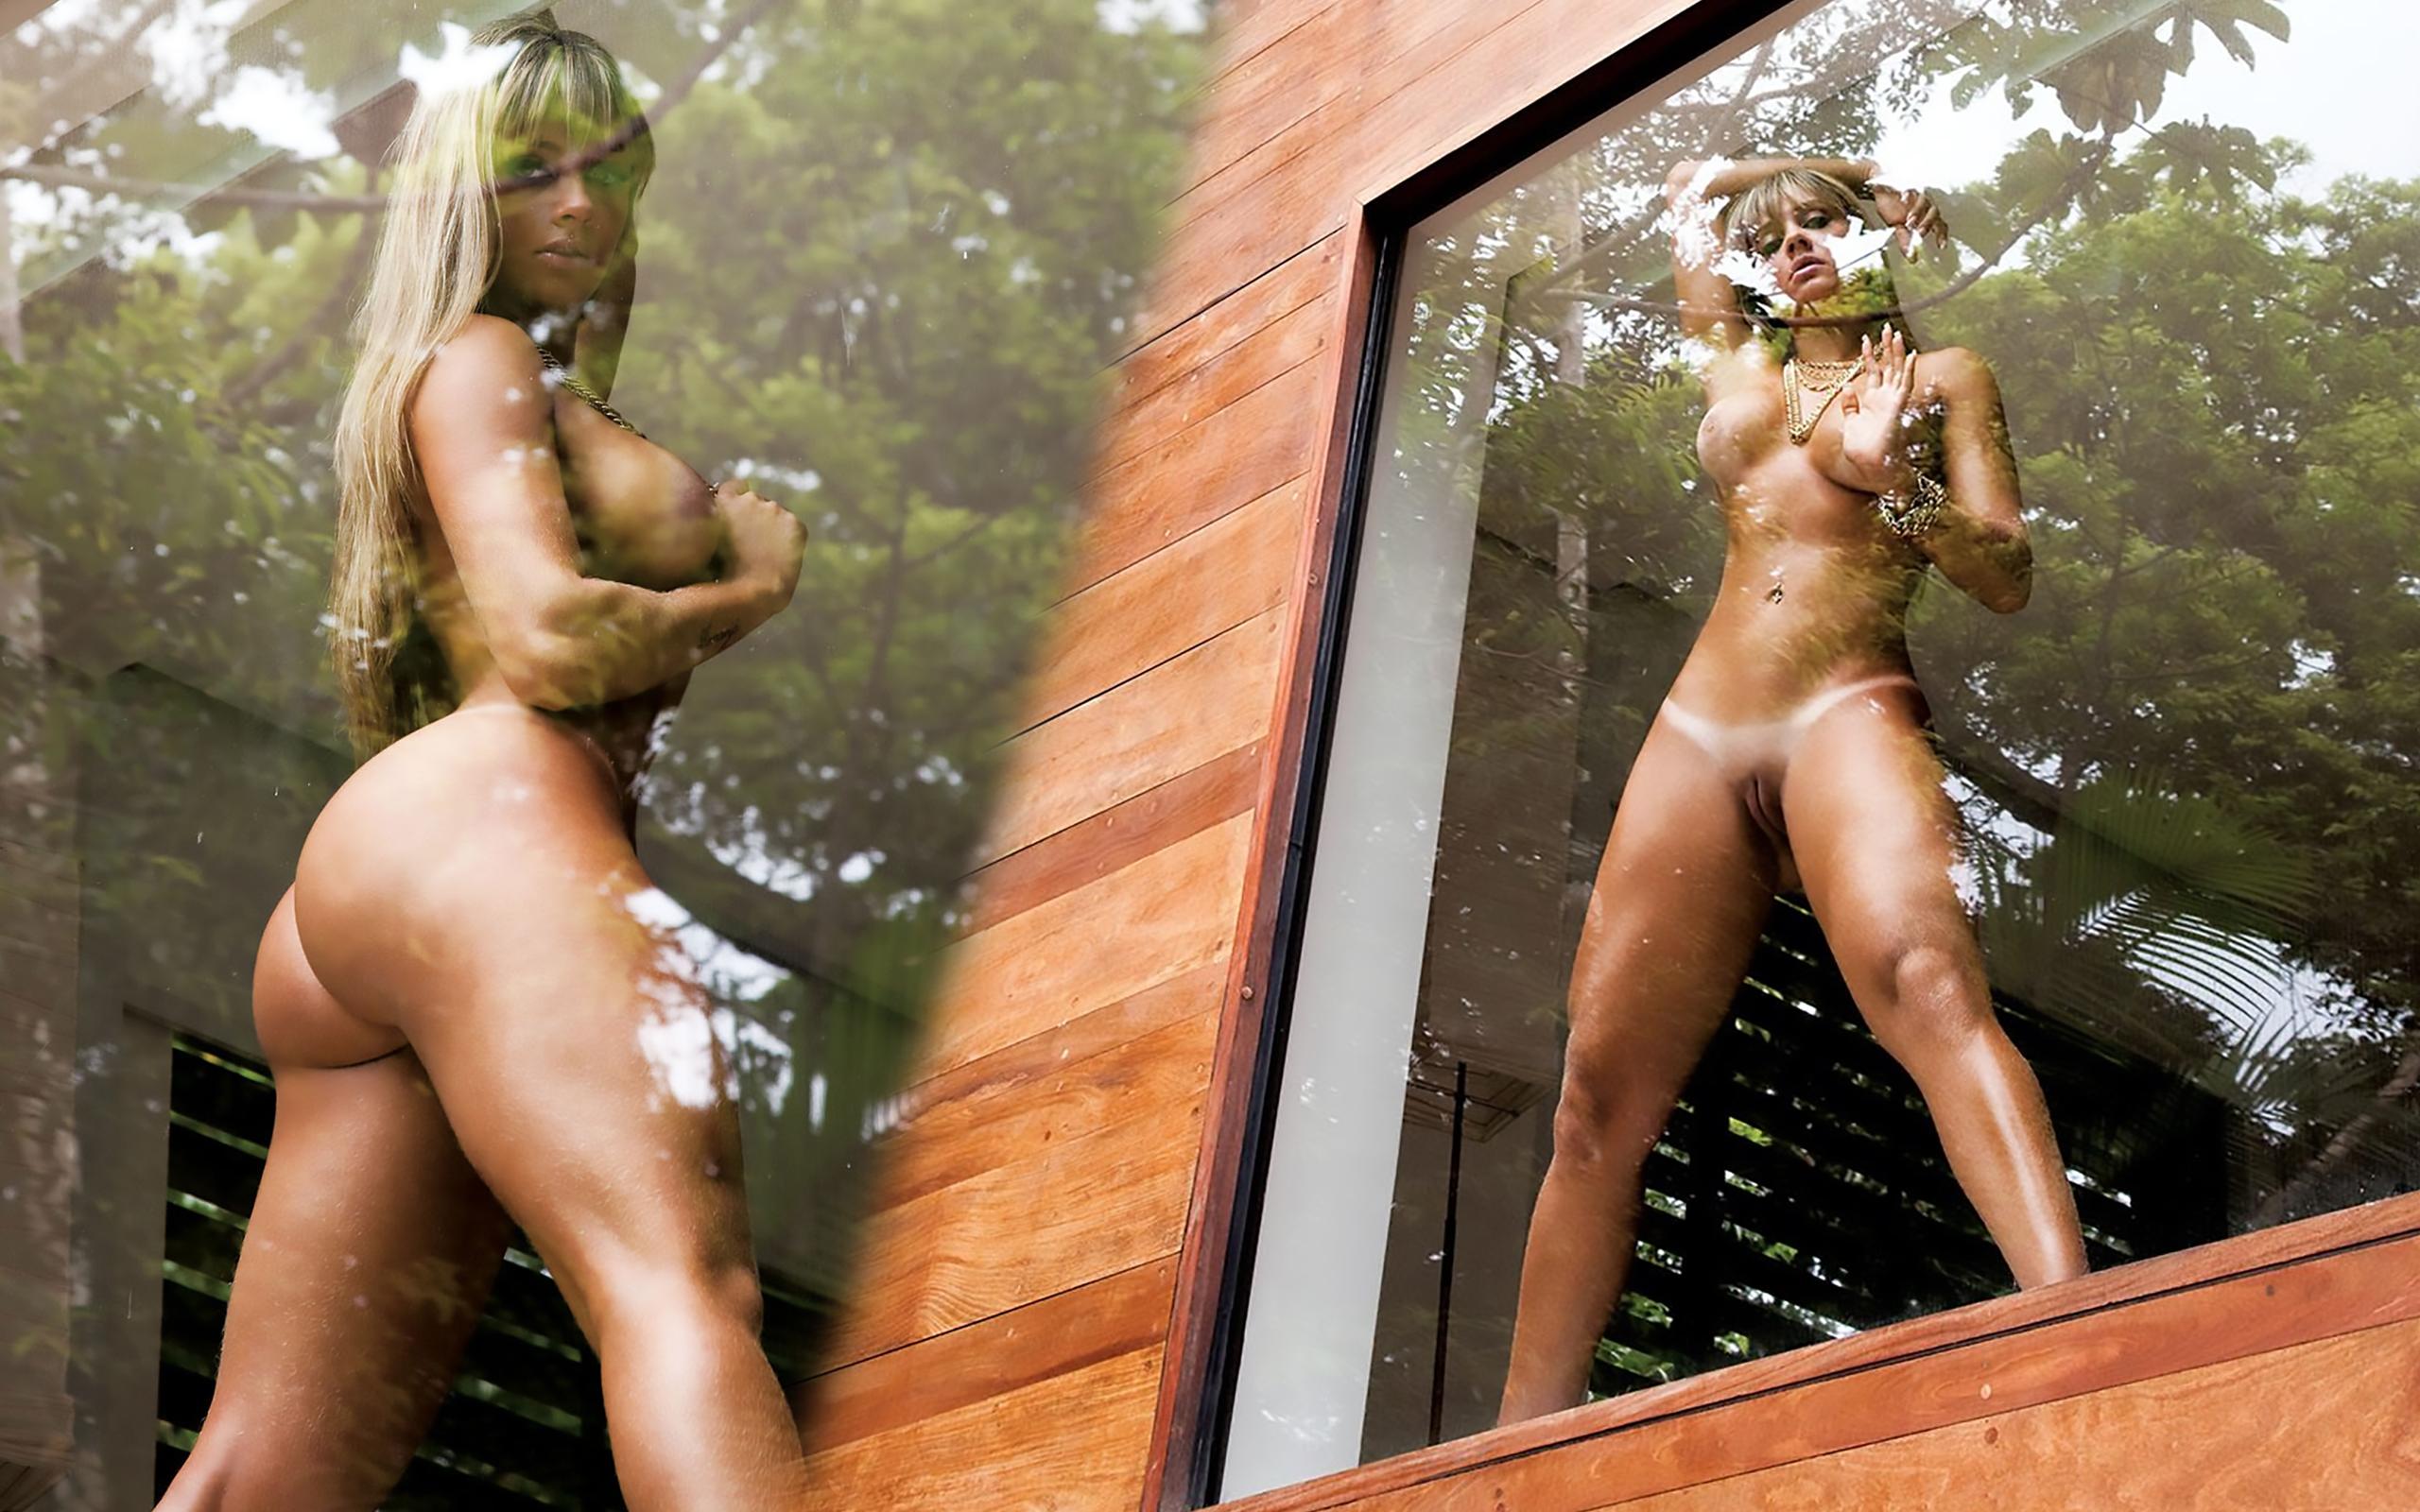 Juju pornstar nude, anjali nude and sexy